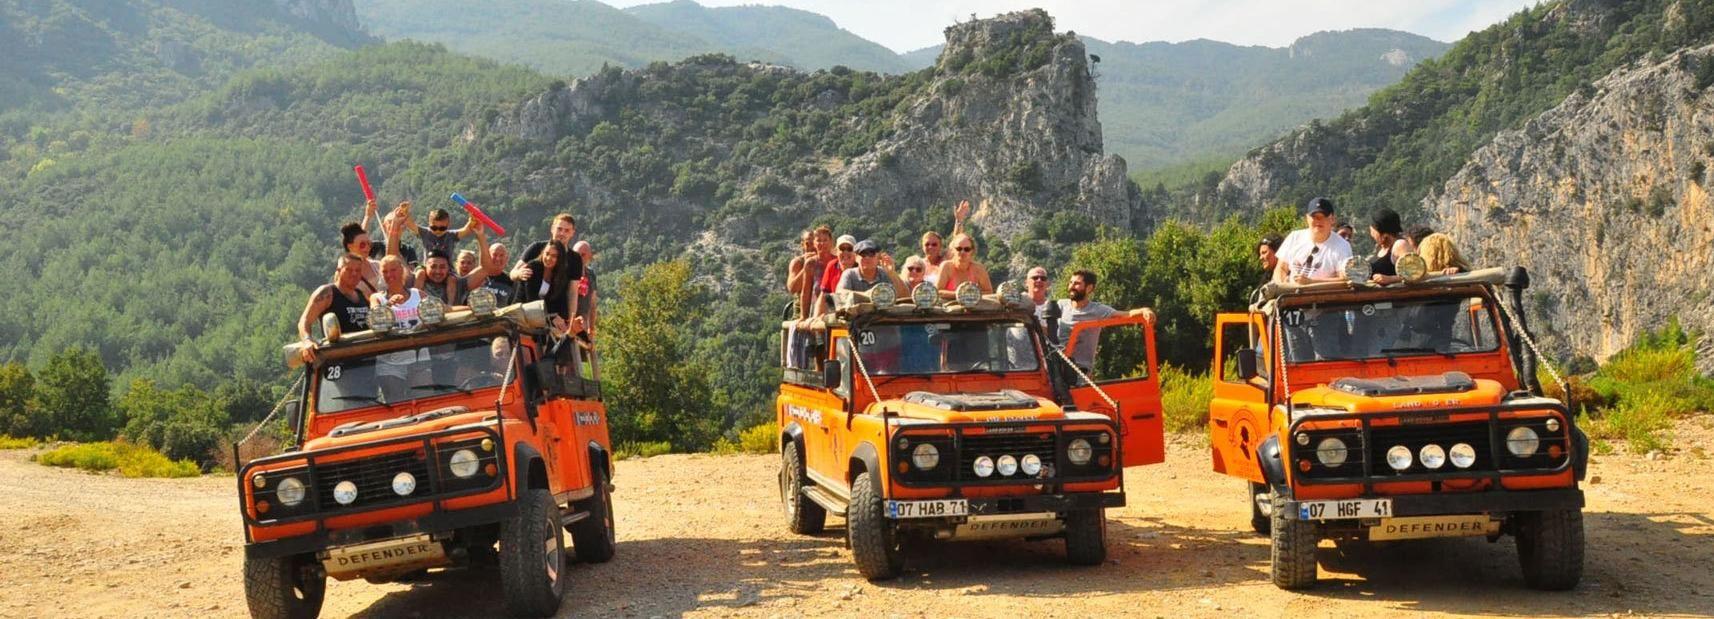 From Kusadasi: Full-Day Jeep Safari to National Park